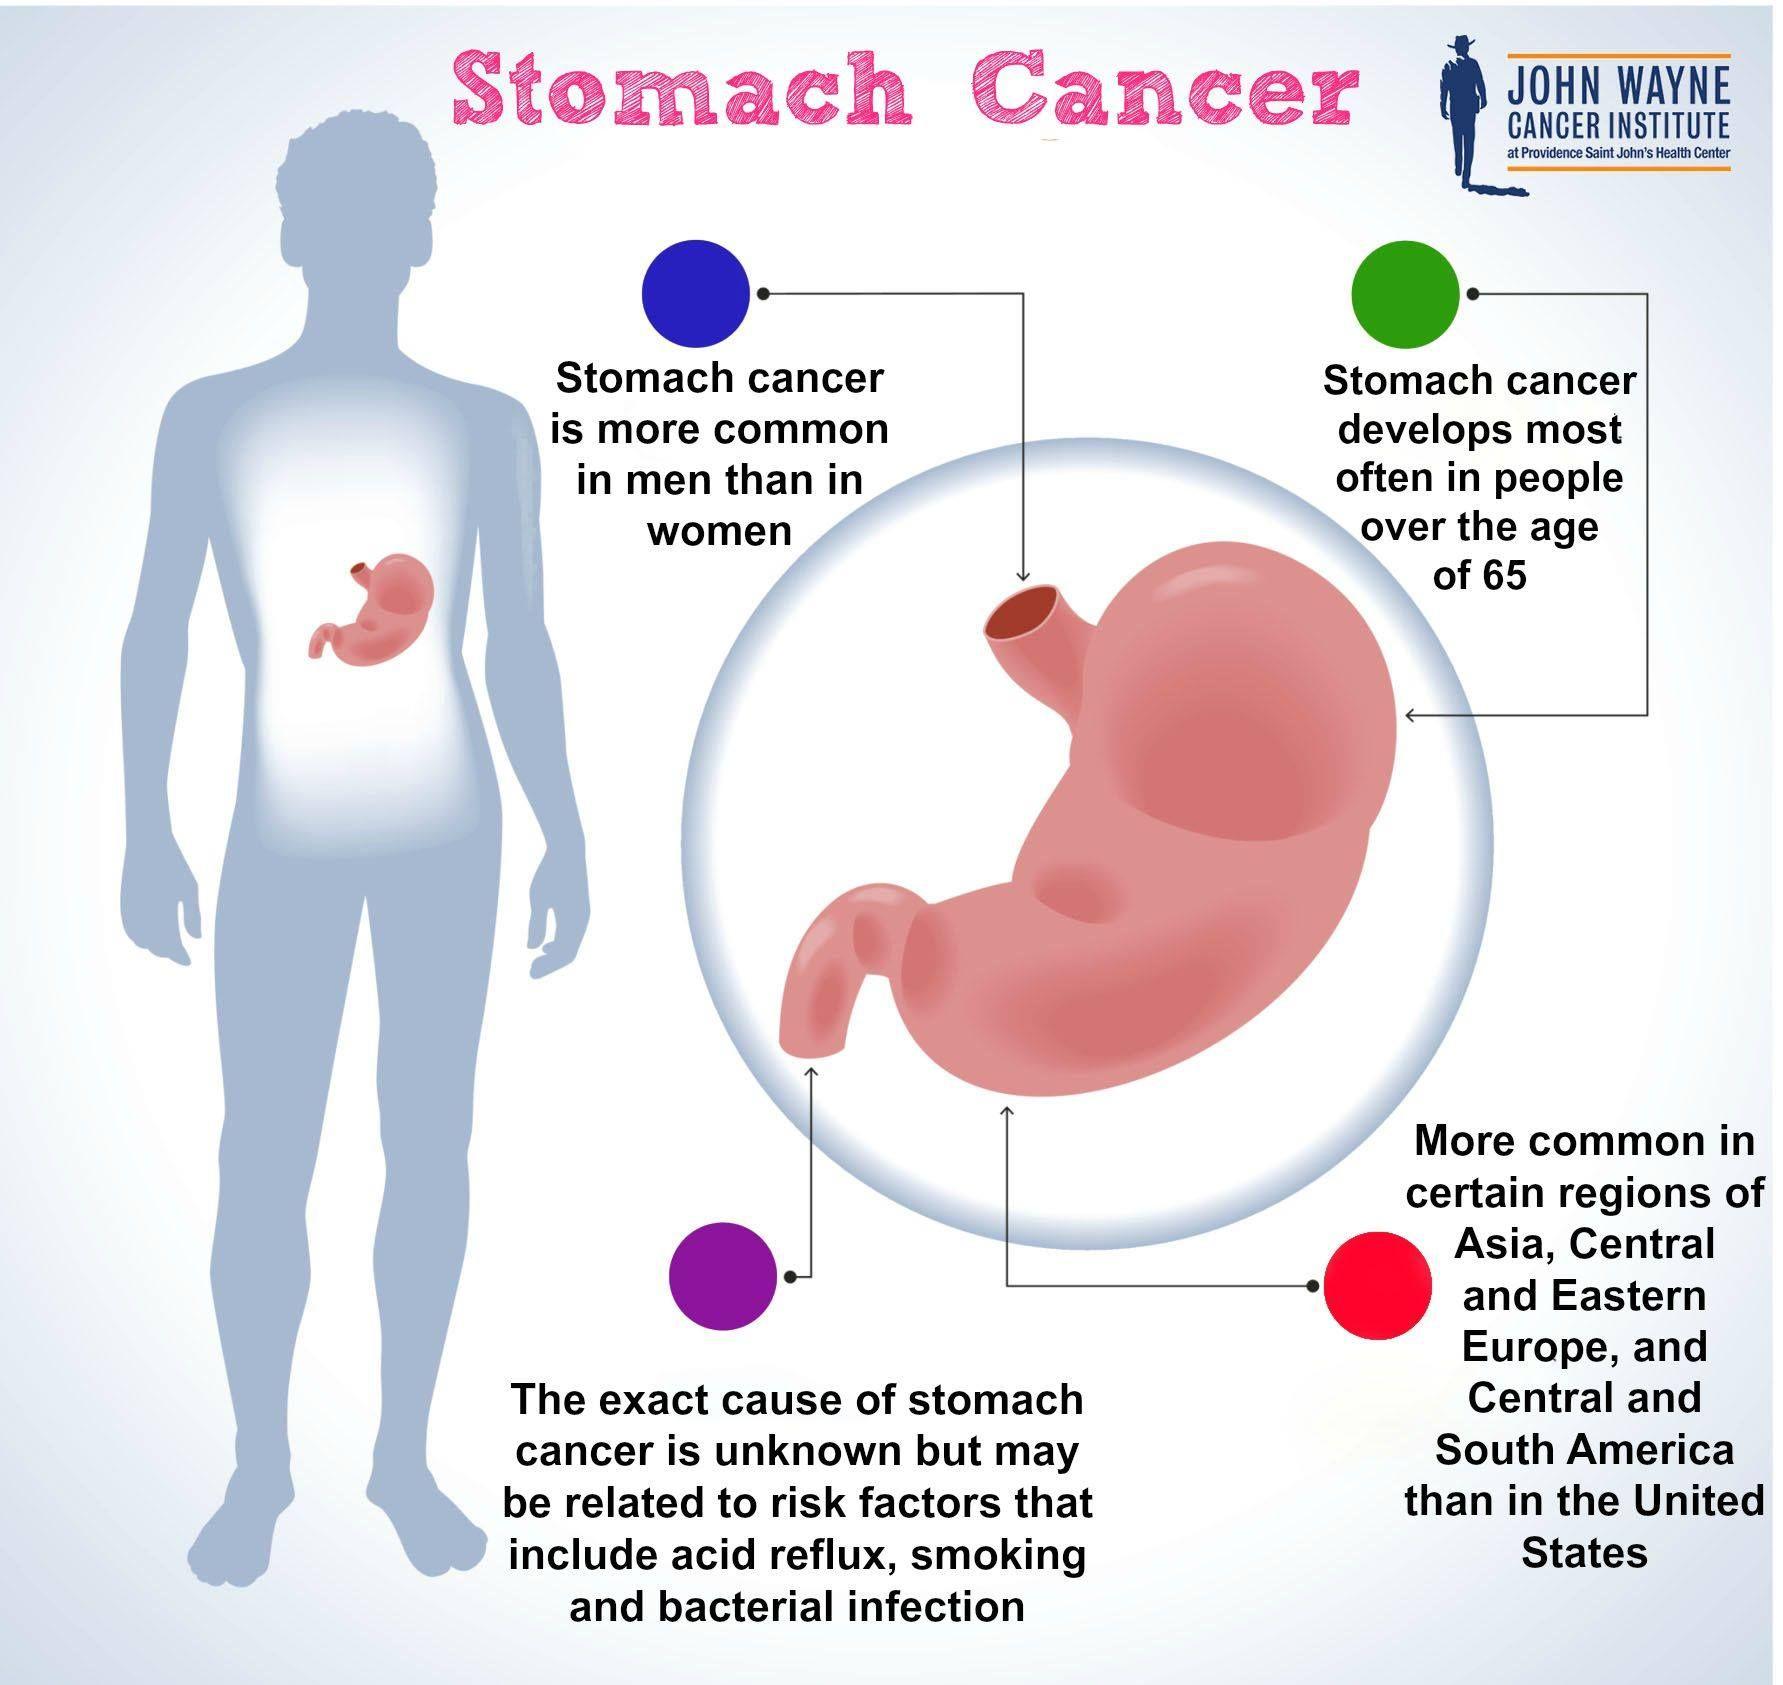 Pin by John Wayne on John Wayne Cancer Foundation | Stomach